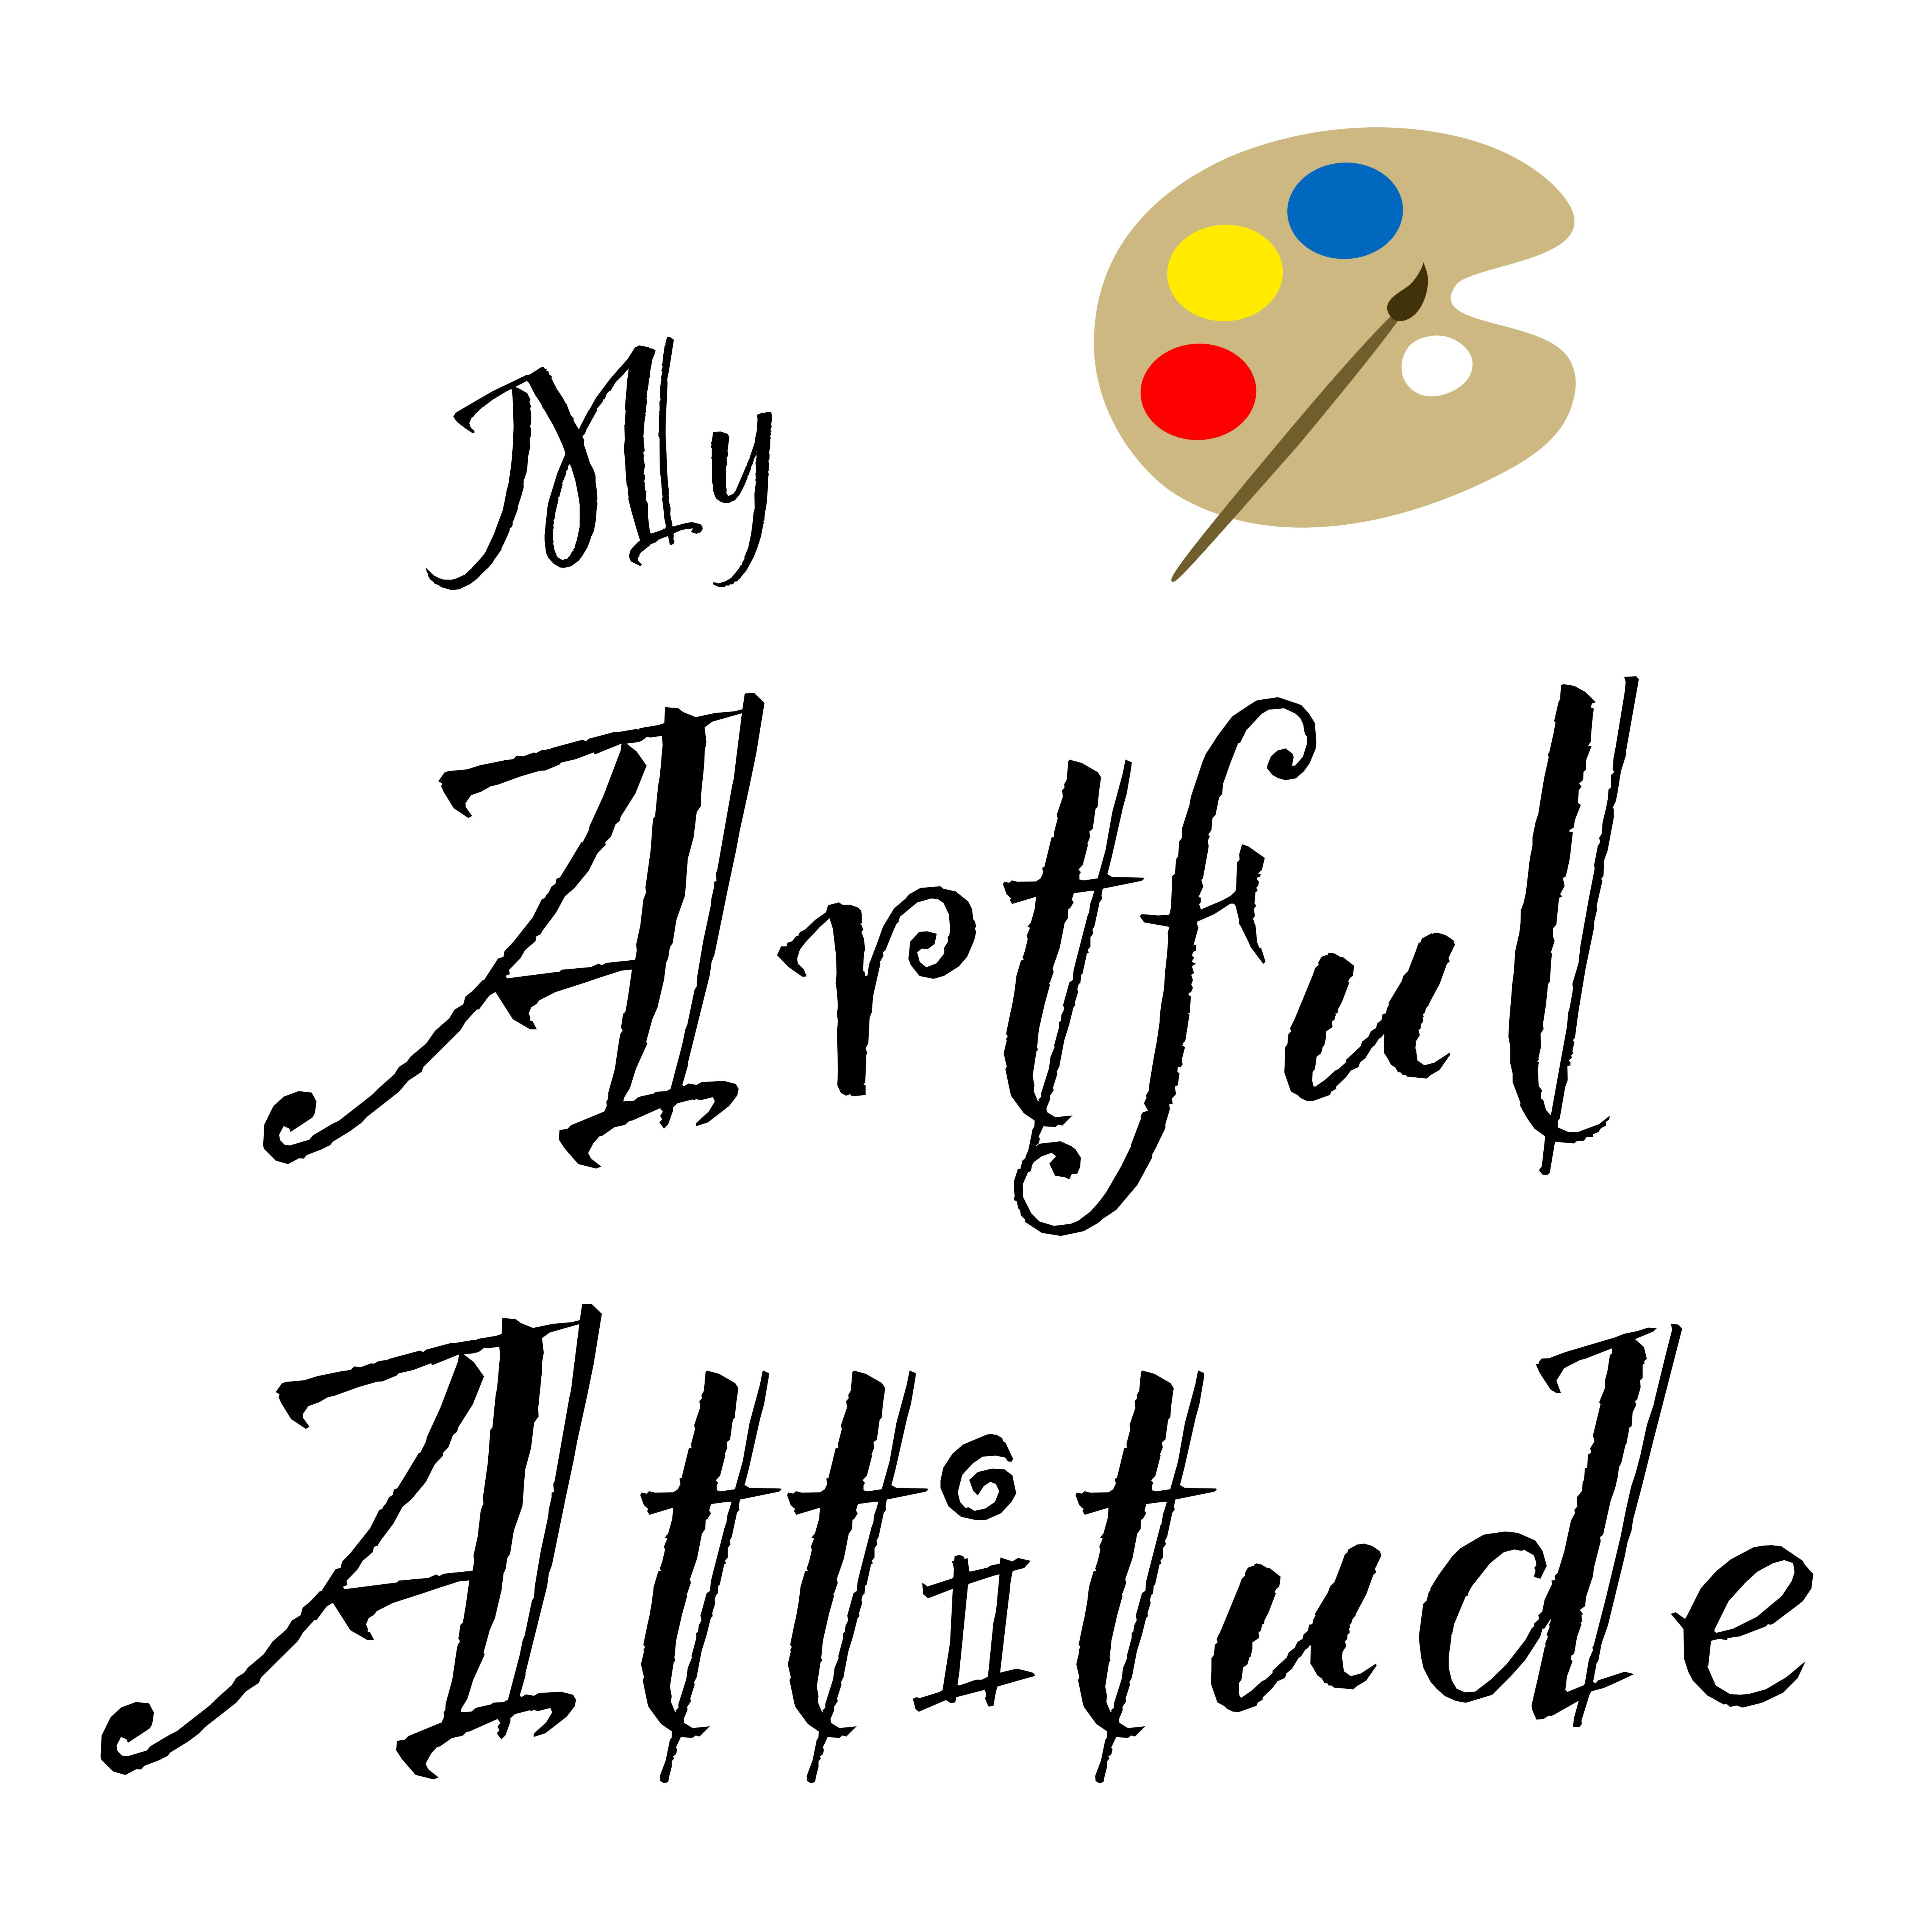 MyArtfulAttitude